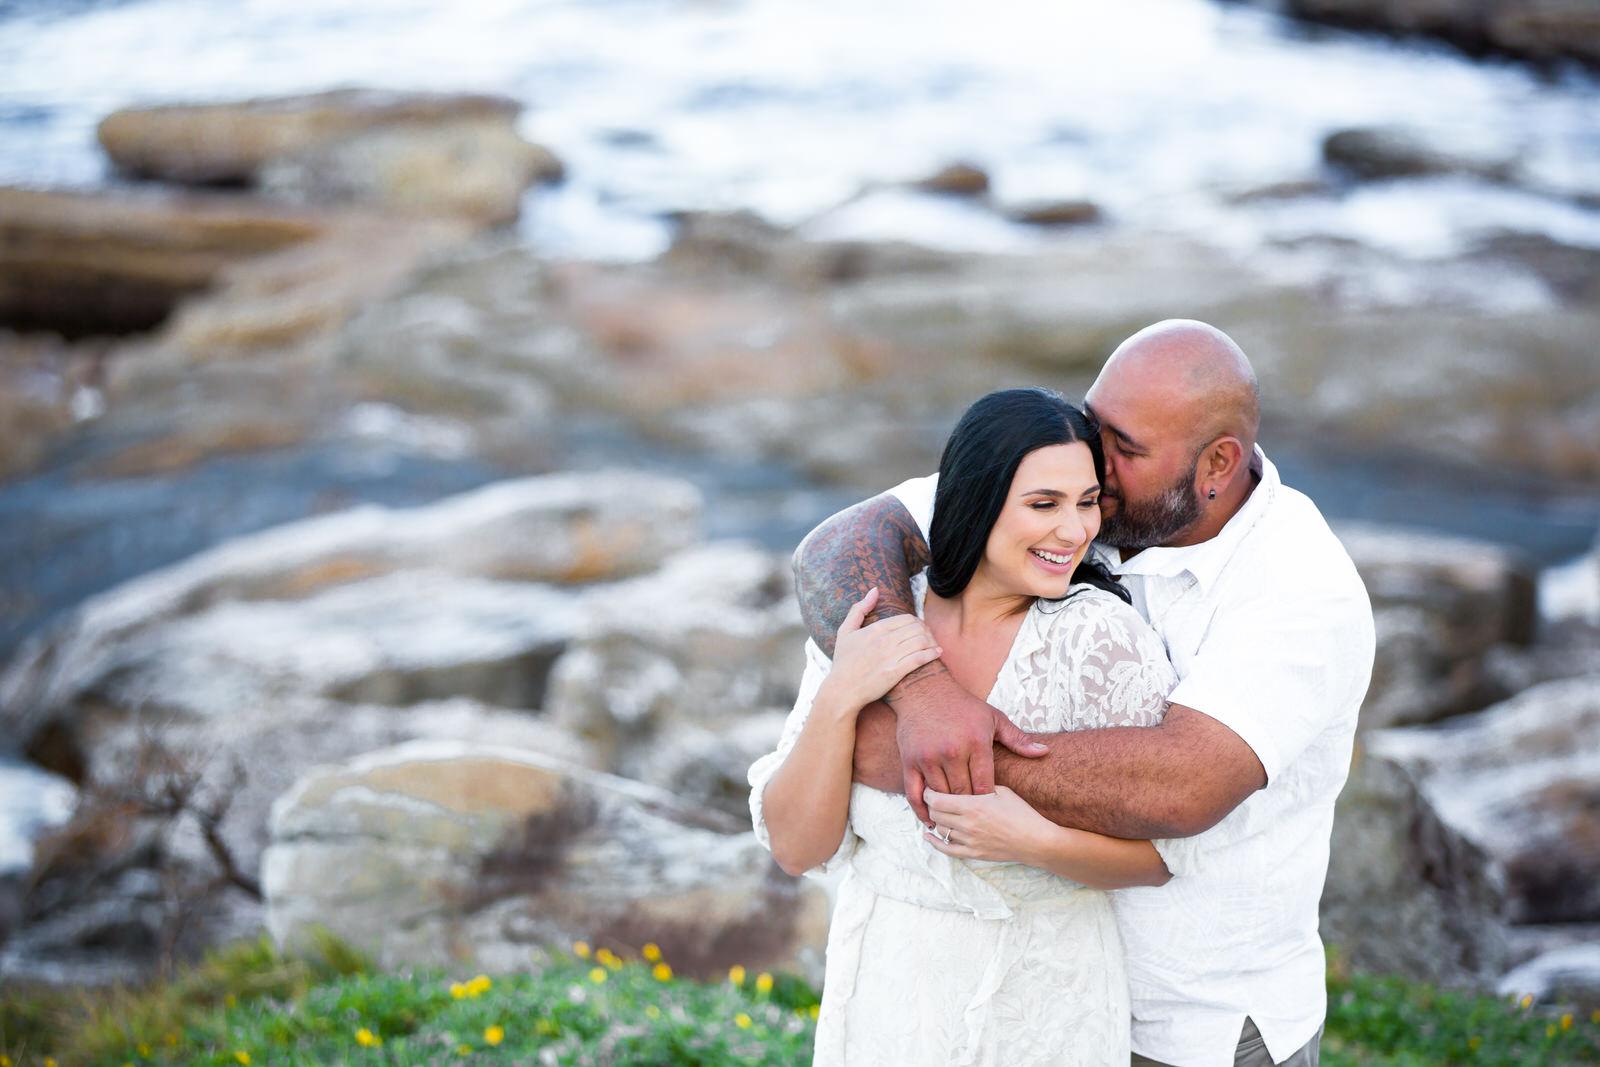 Sydney Wedding Photographer - Maroubra Beach - Jennifer Lam Photography (18).jpg